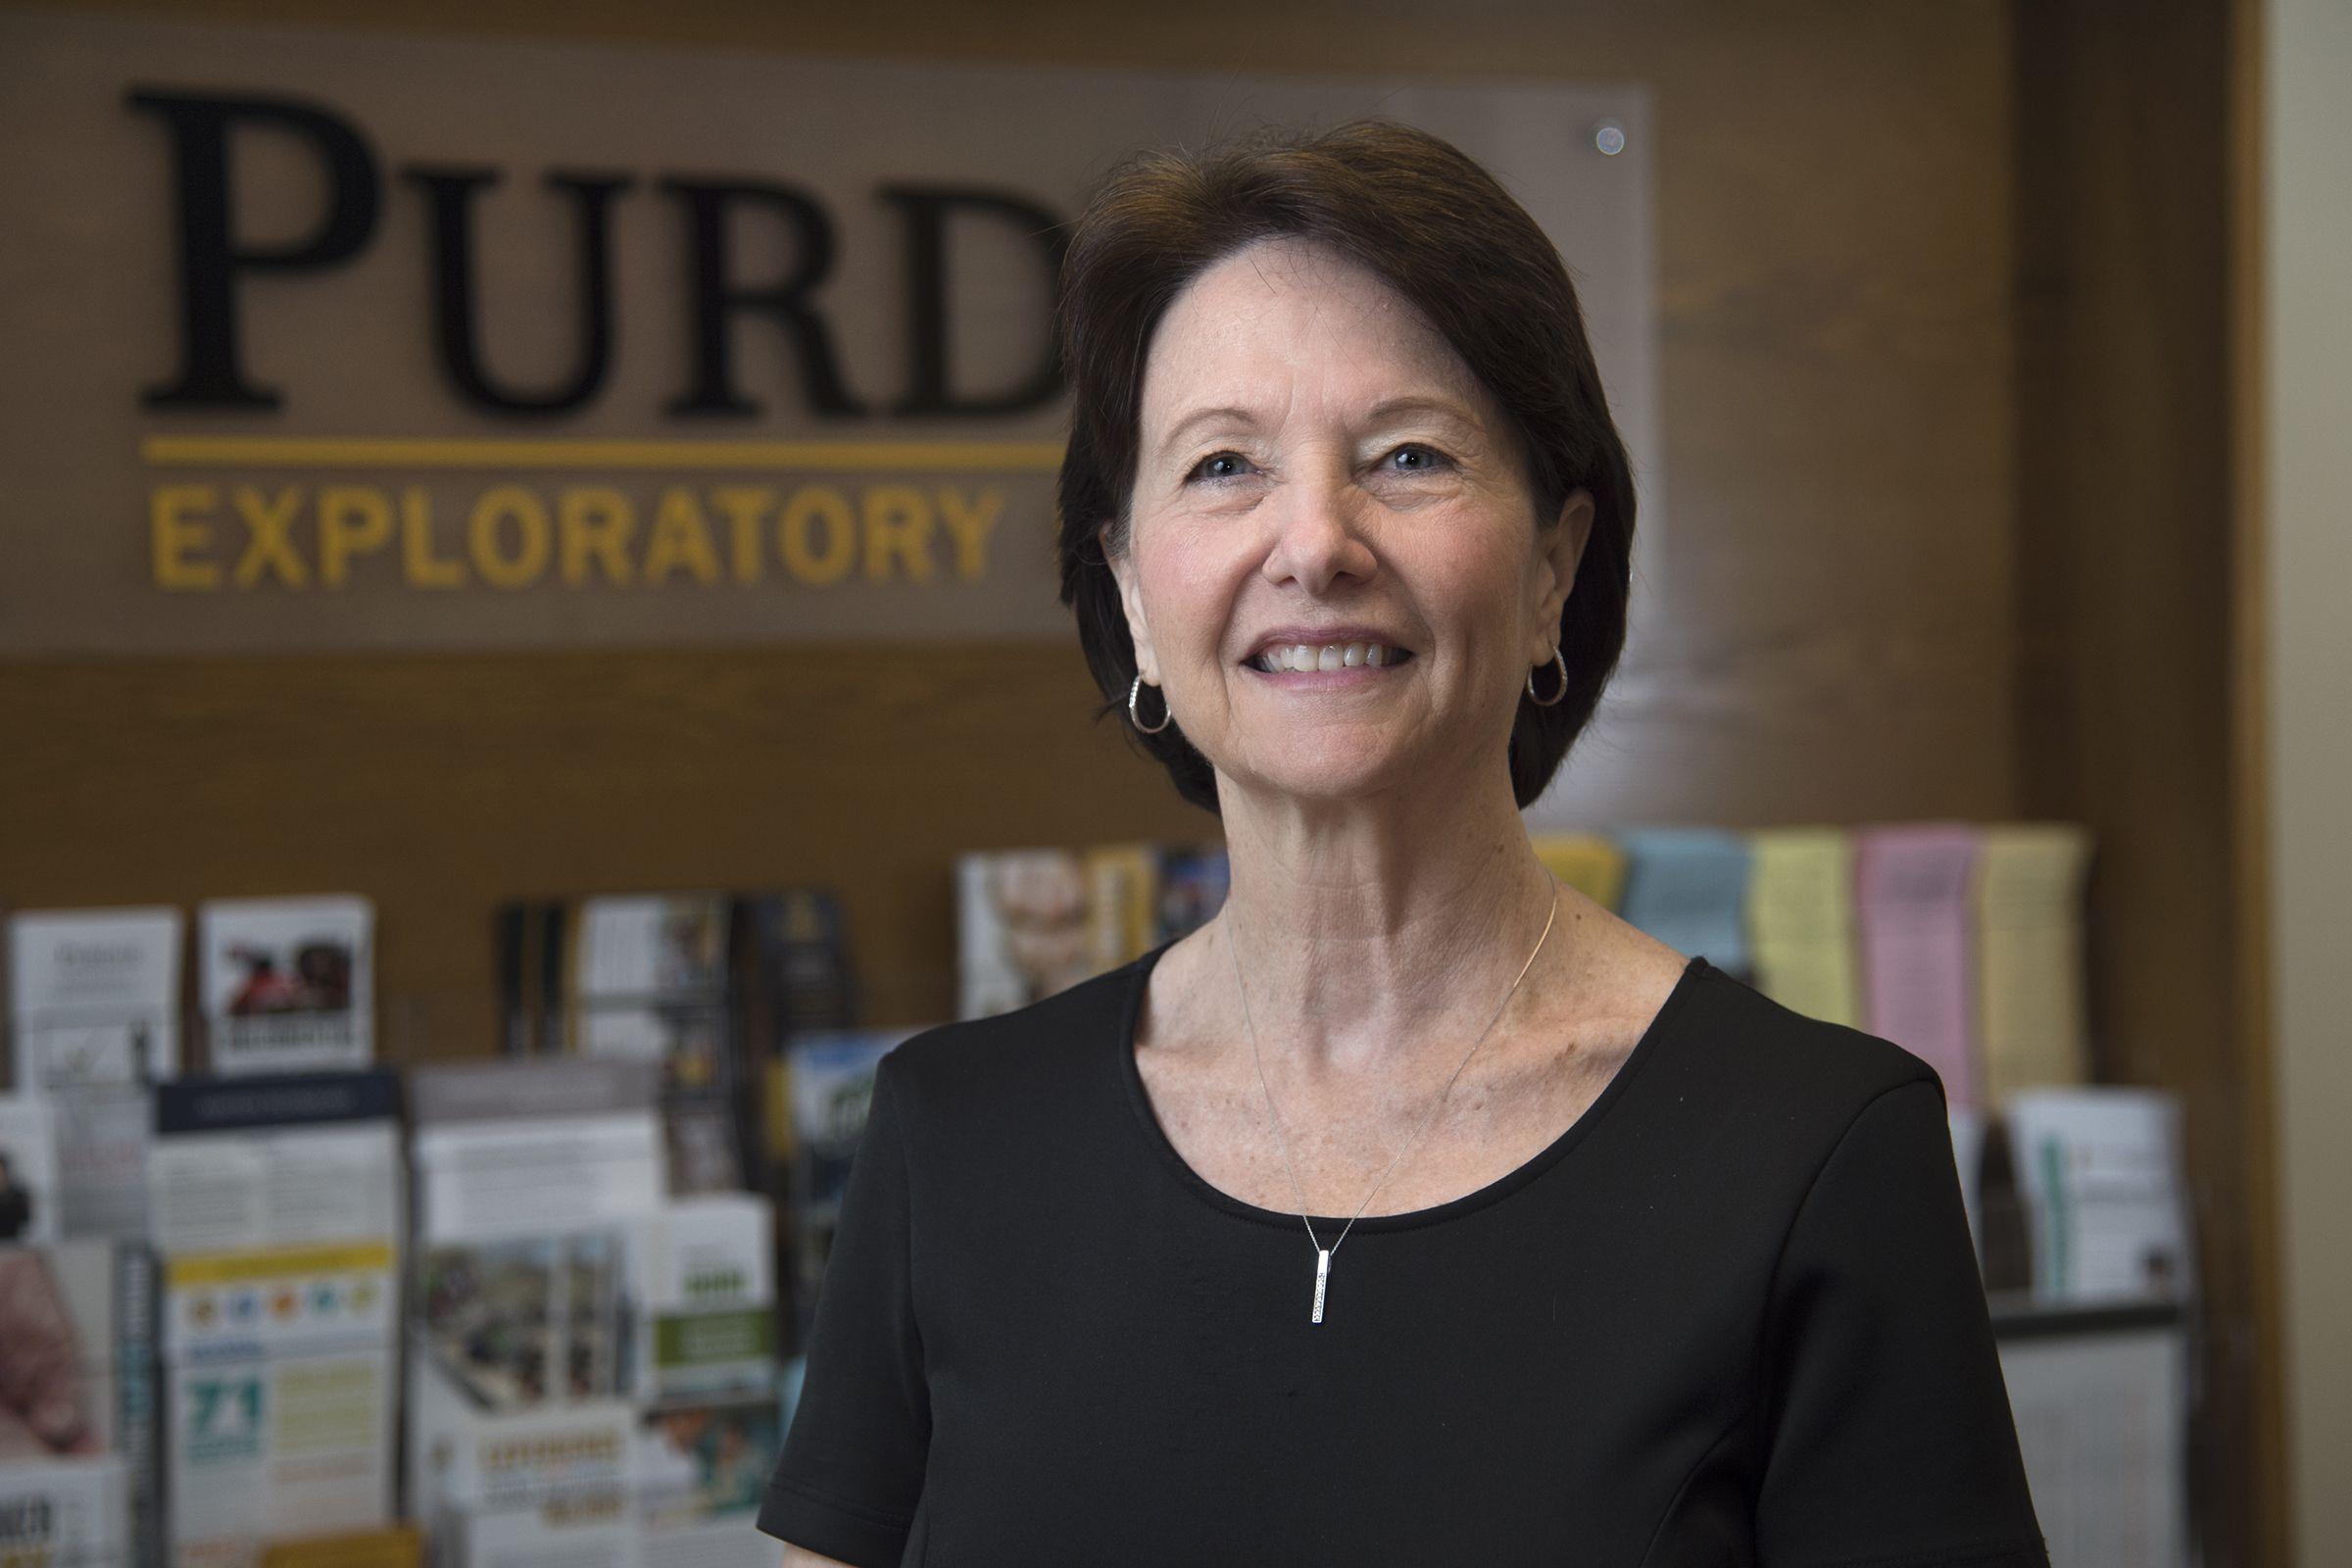 Exploratory Studies, what a great program! Led by Director Susan Aufderheide (photo via link)